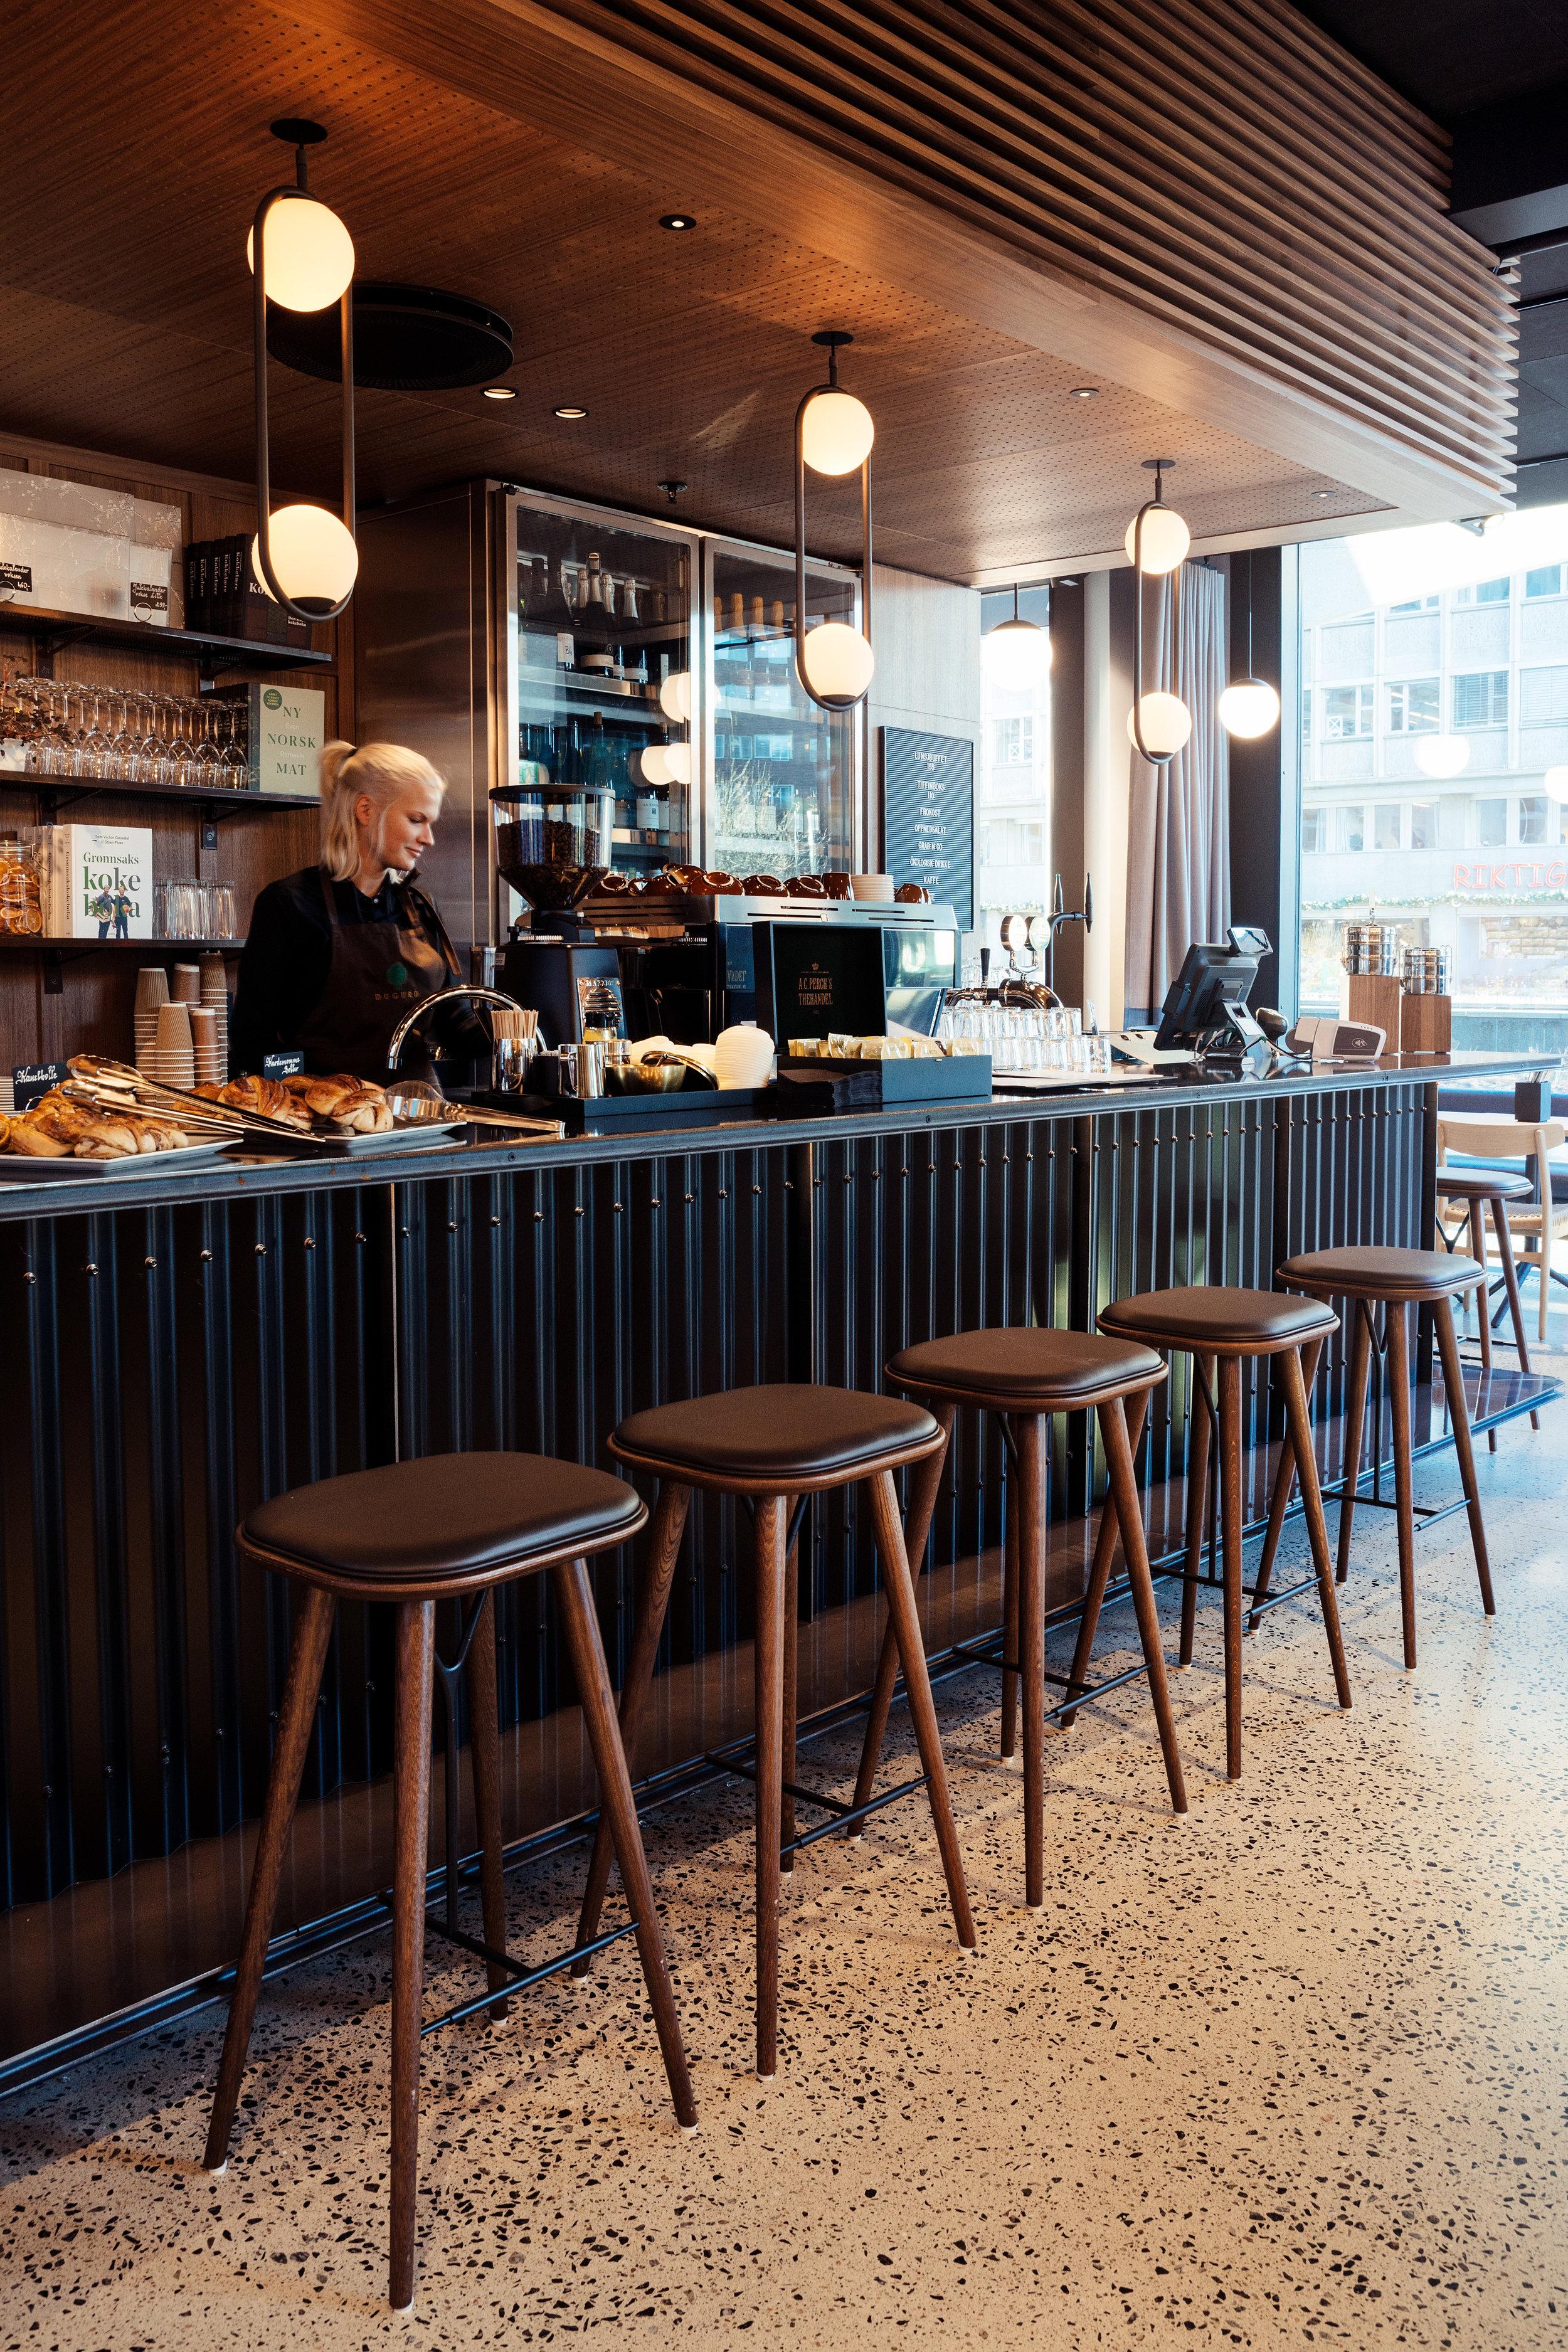 Haakon-dugurd-kantine-bar.jpg